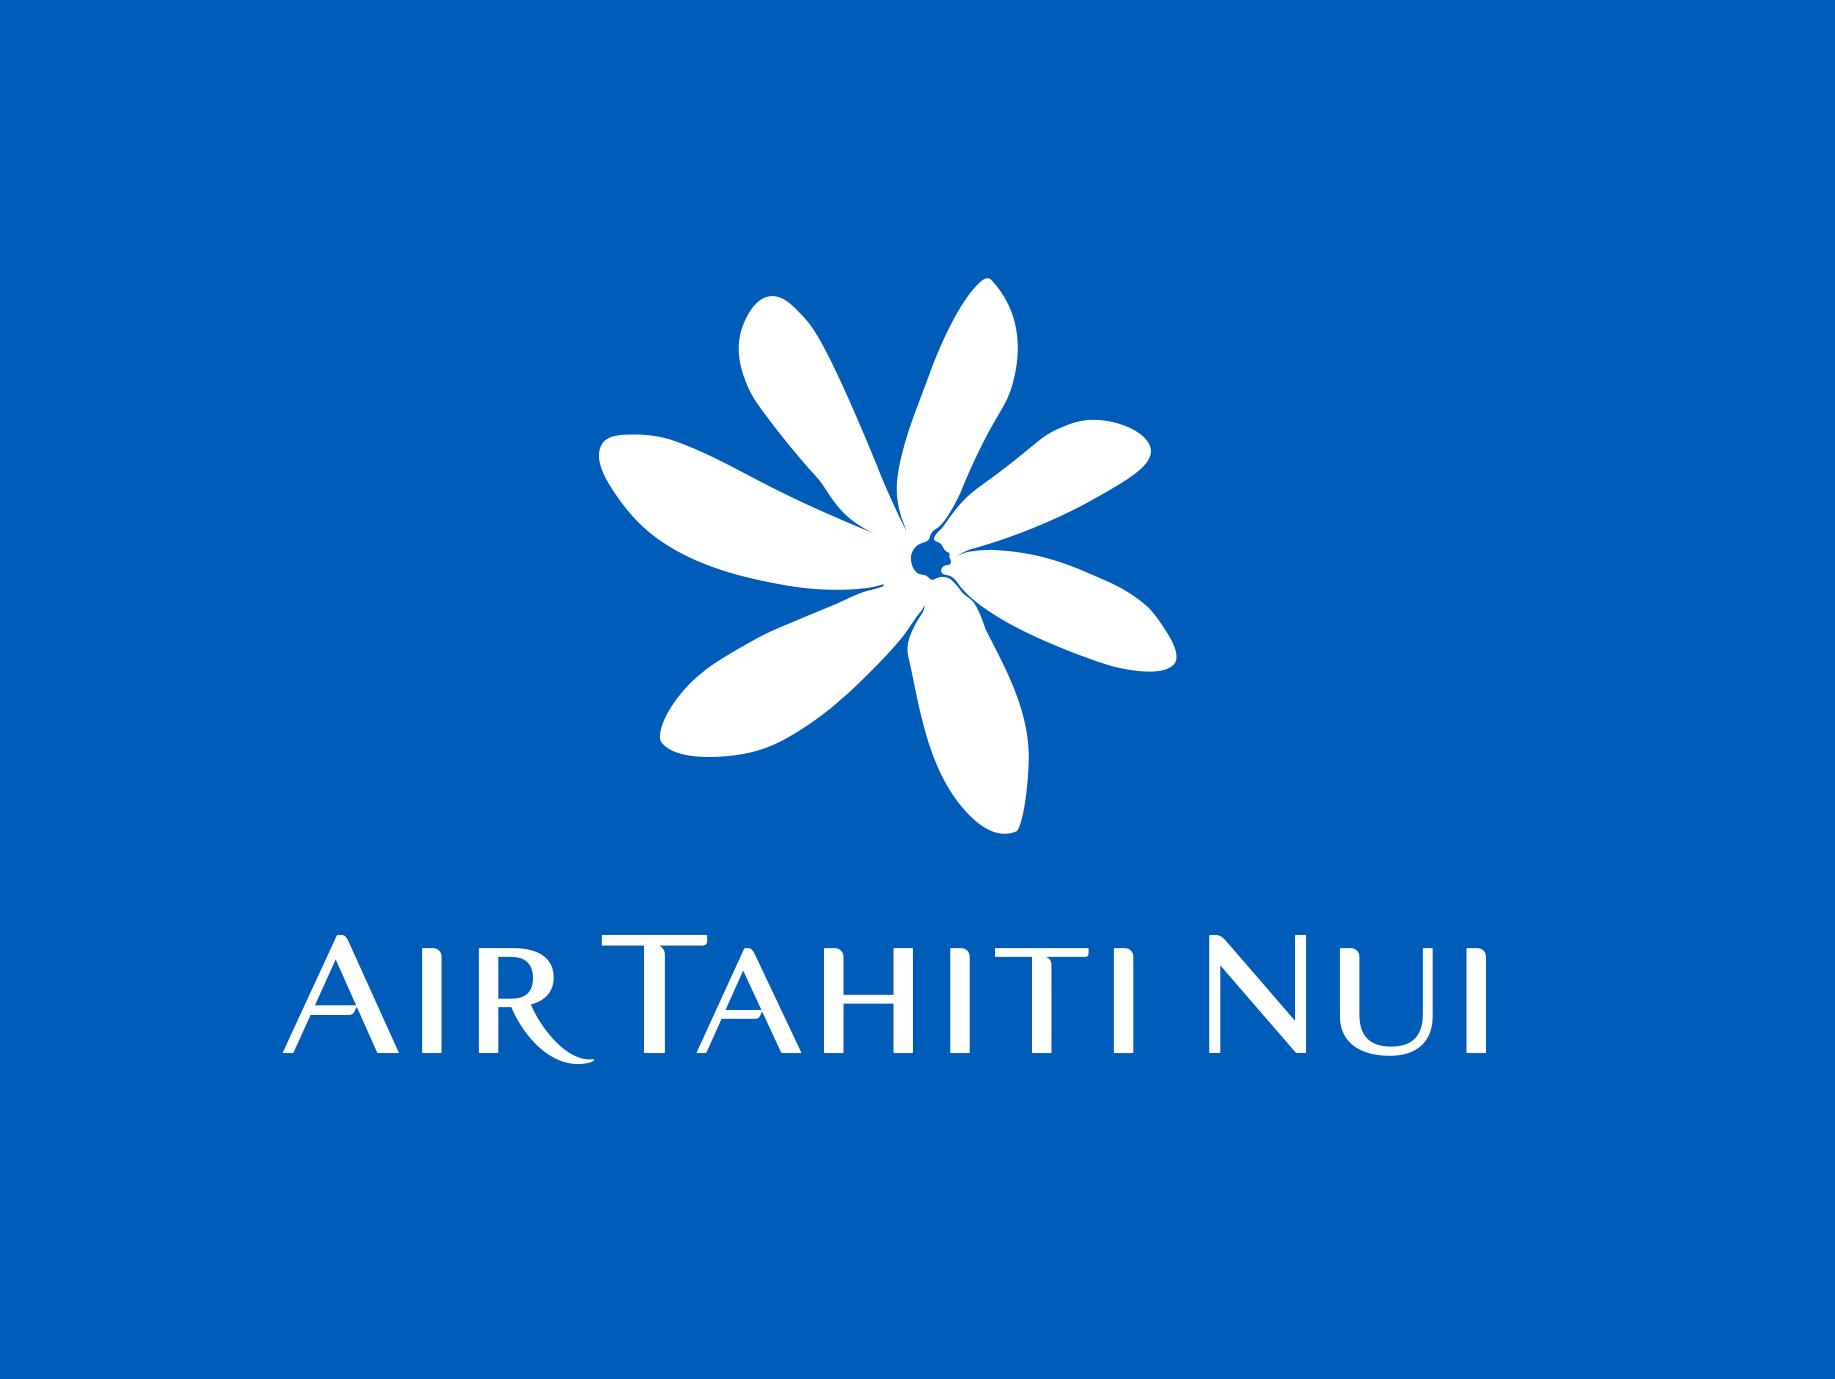 Air tahiti Nui logo.png